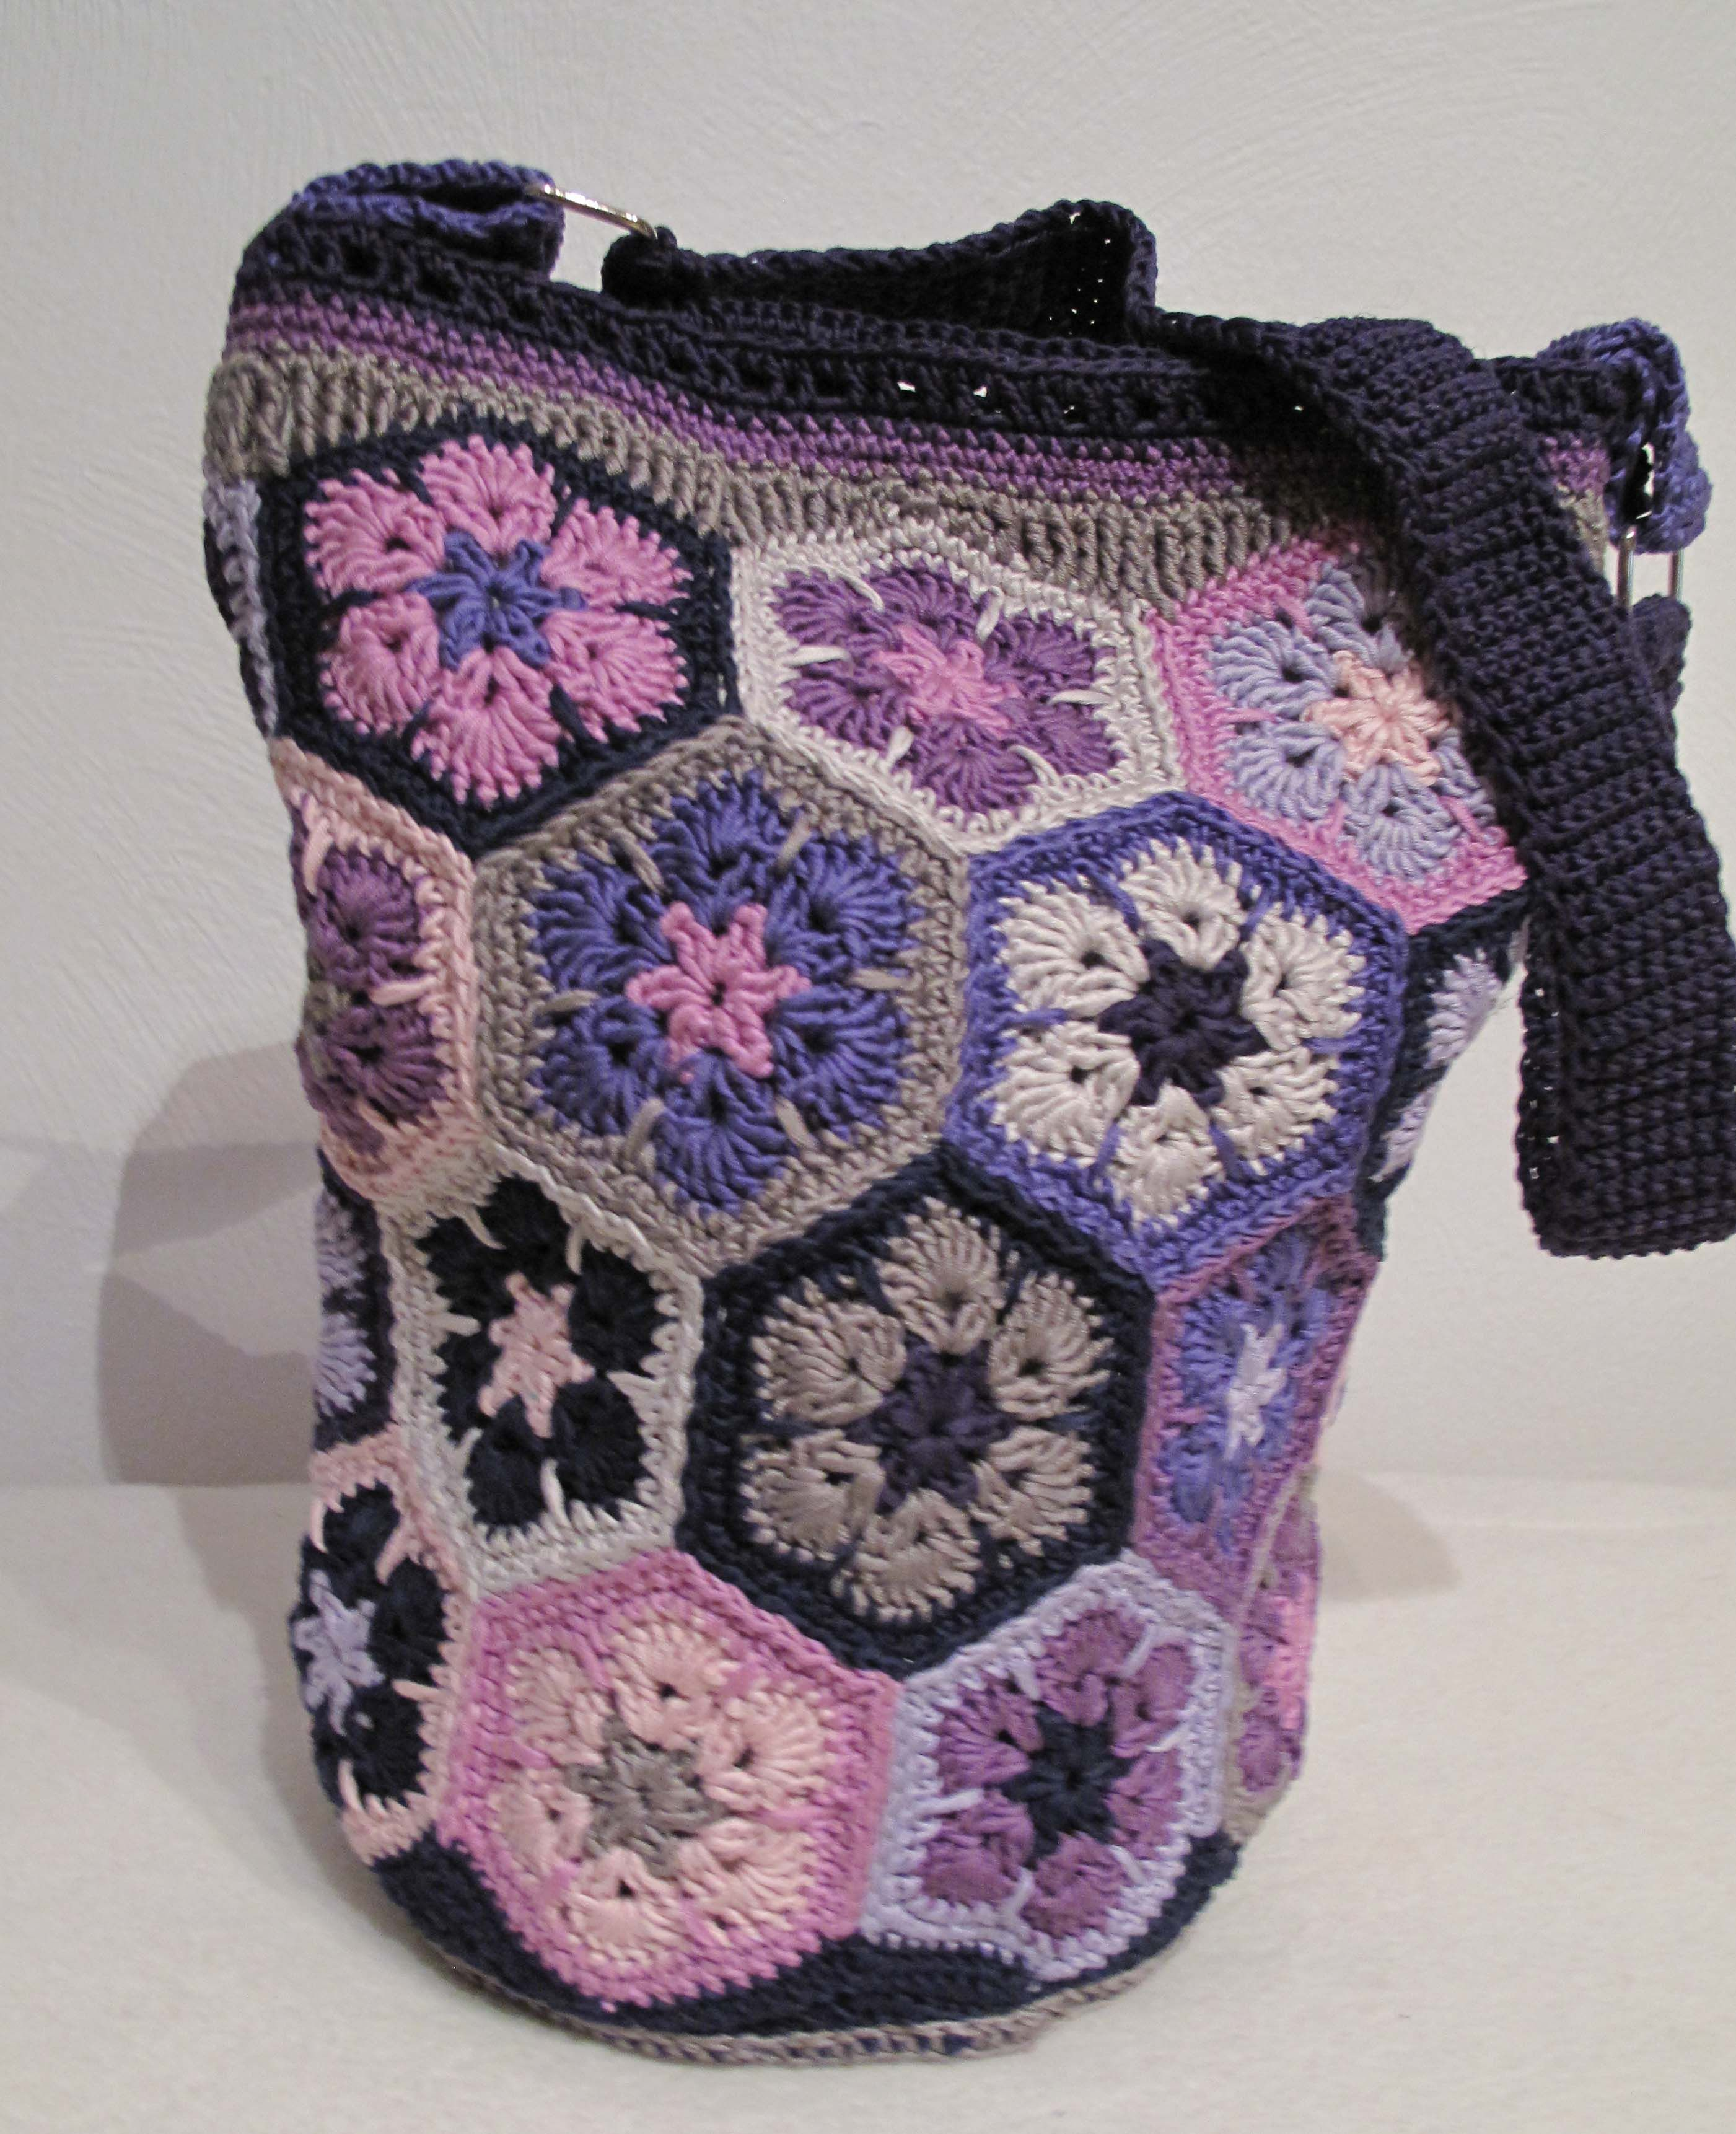 Crochet Flower Bag Pattern : Crochet bag. African flower pattern crochet patterns Pinterest